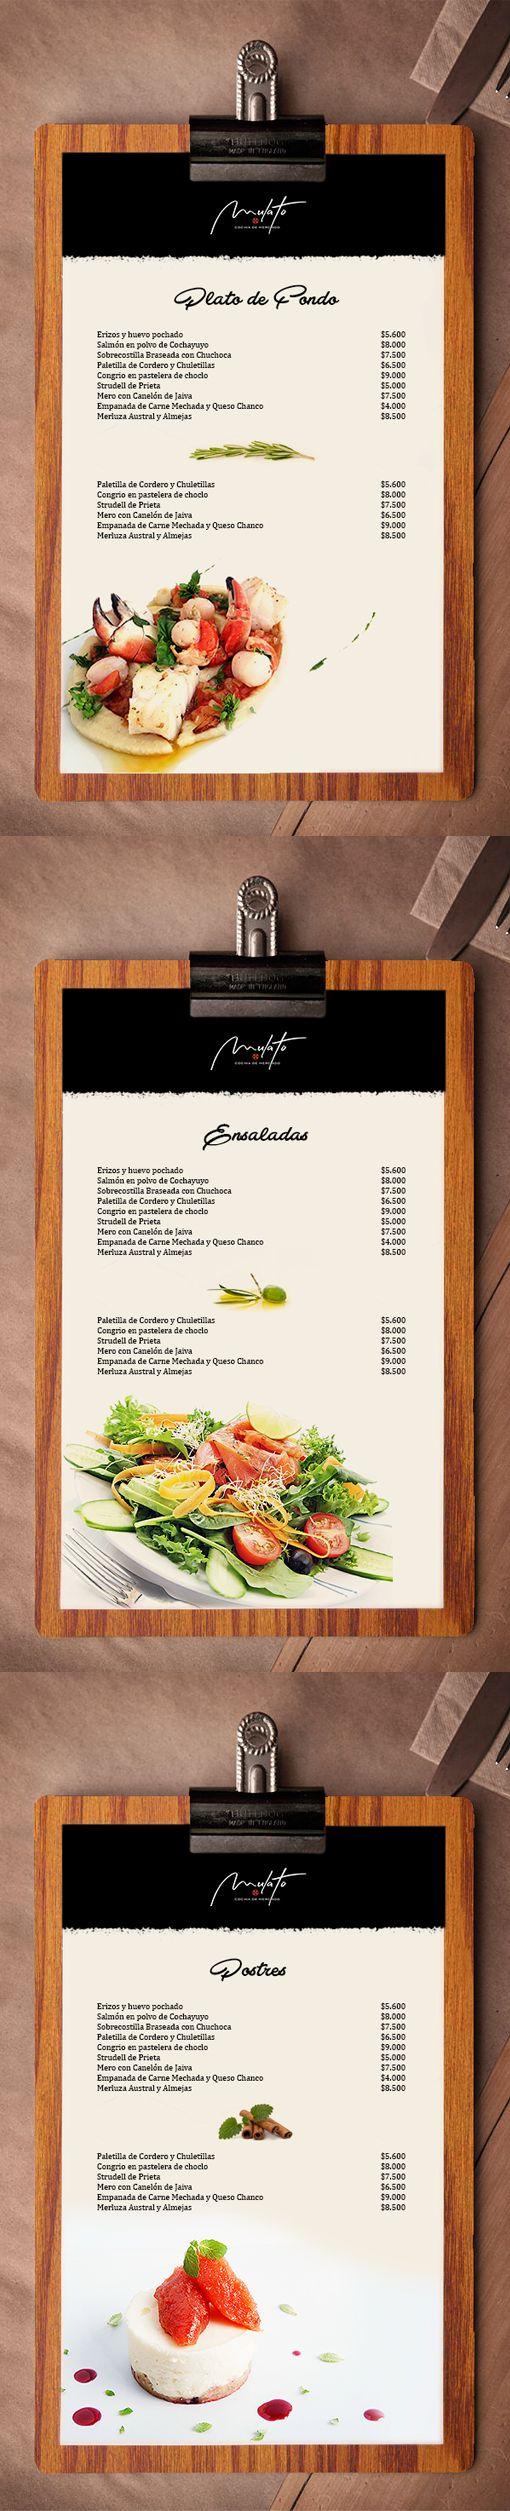 Mulatto propuest design for restaurant